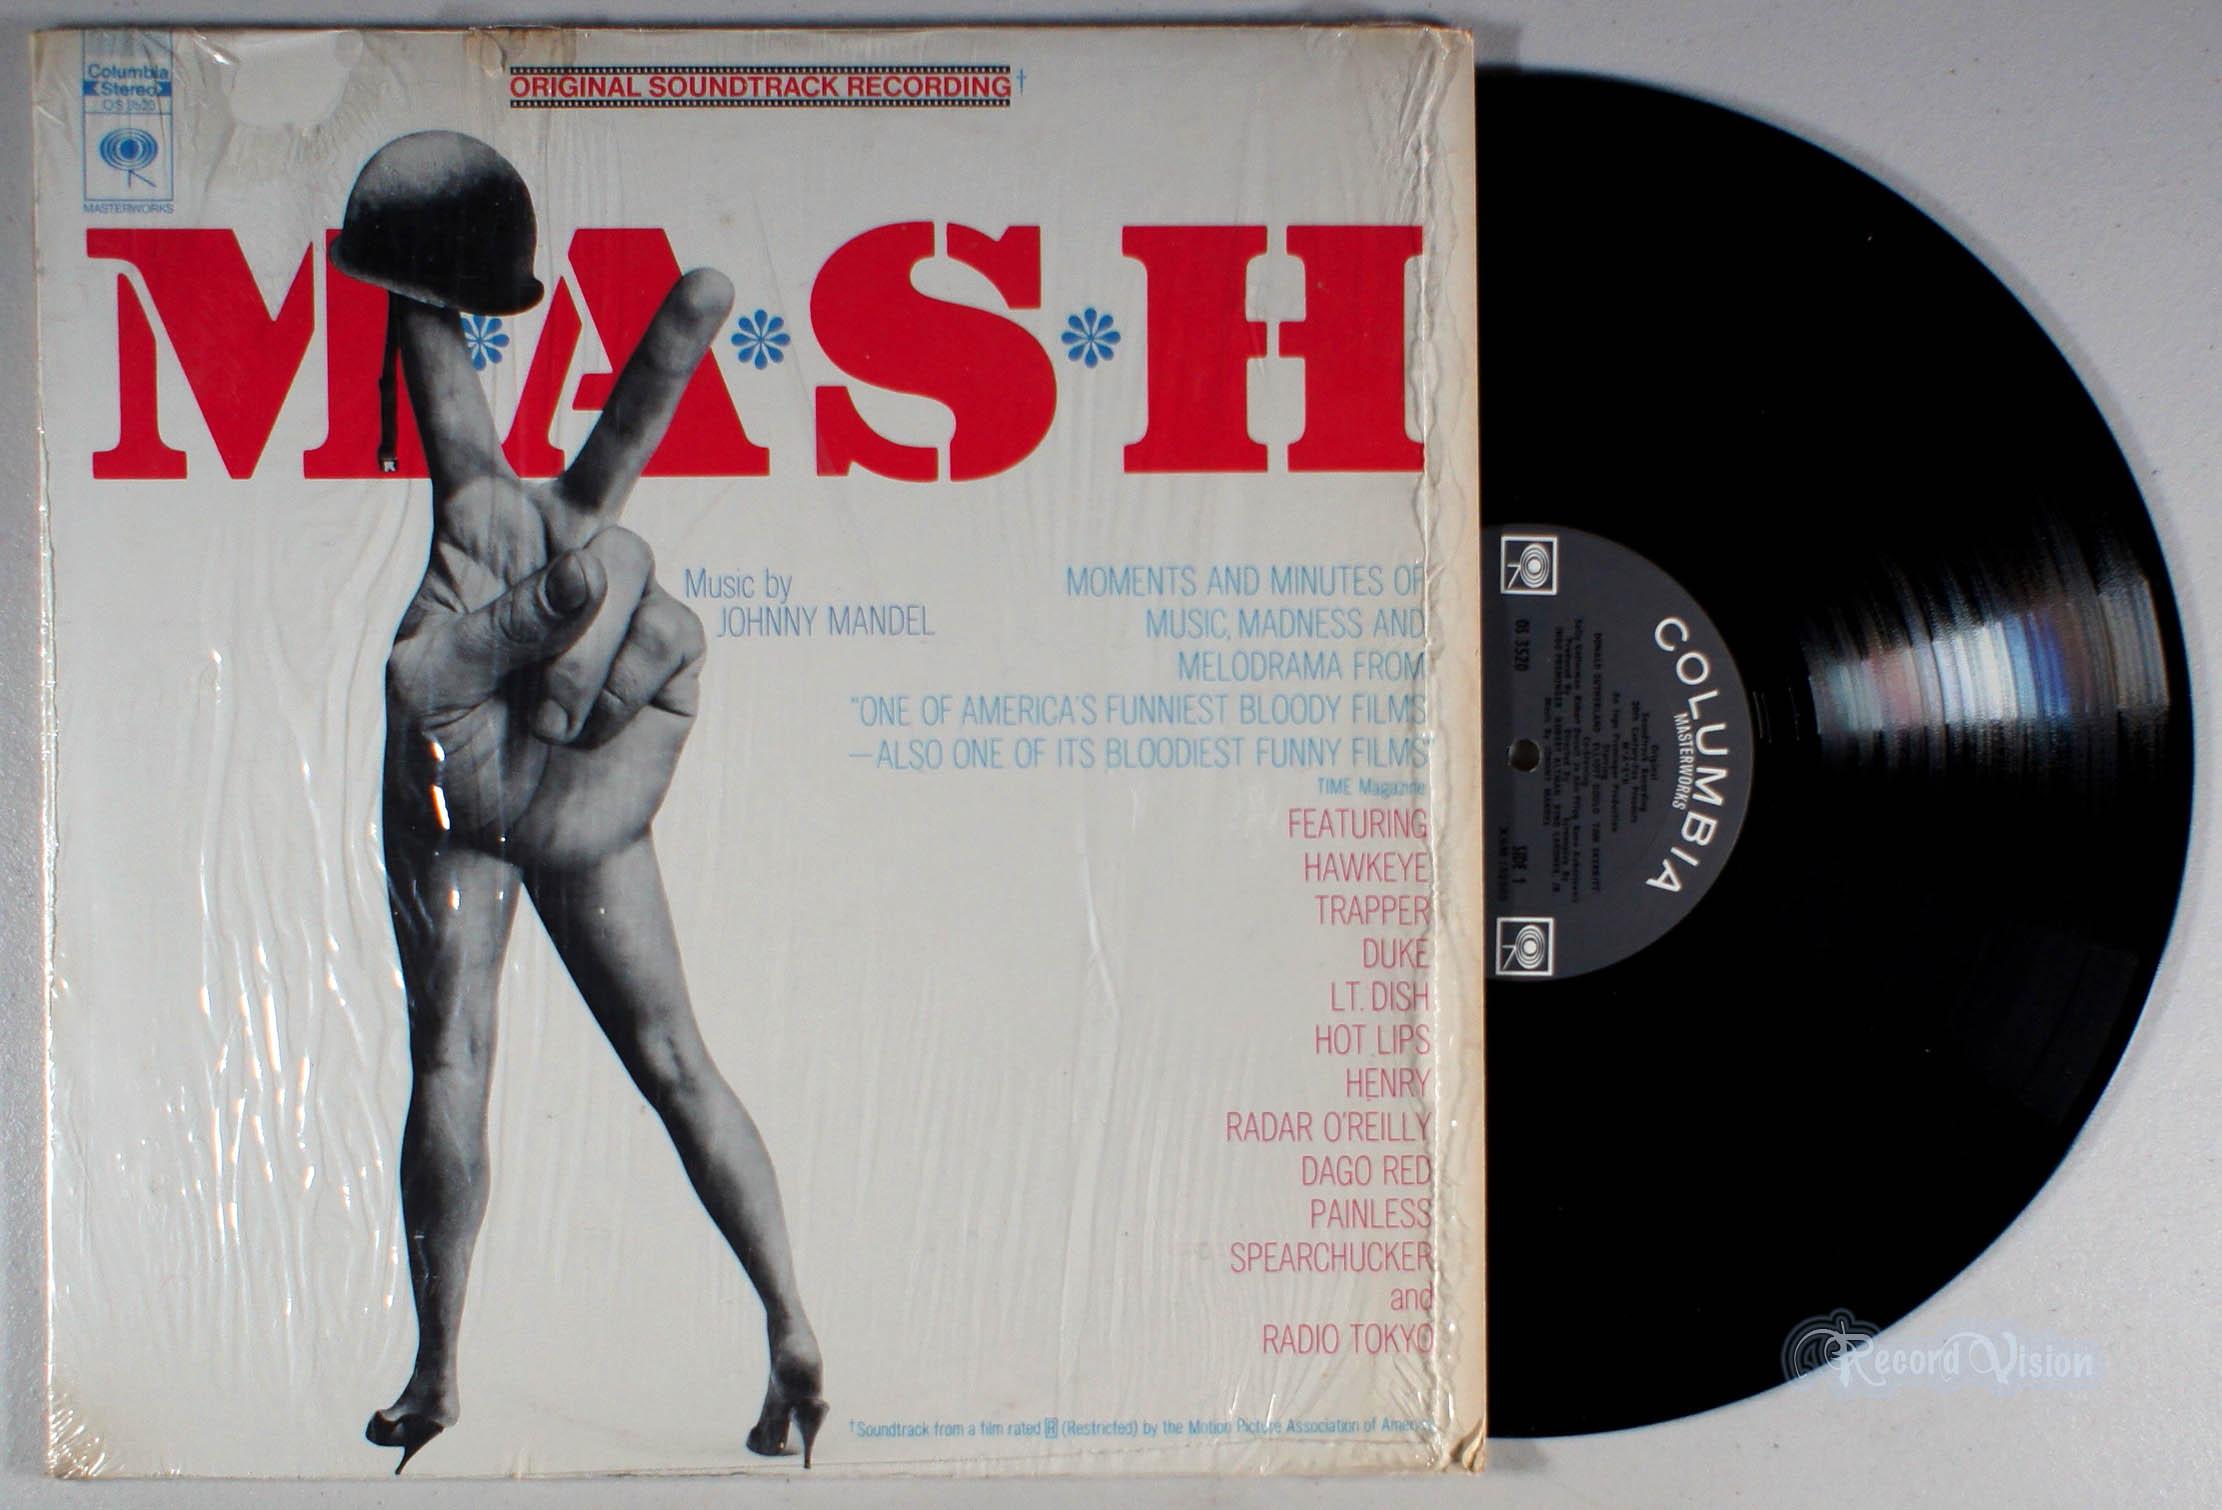 JOHNNY MANDEL - MASH - 33T